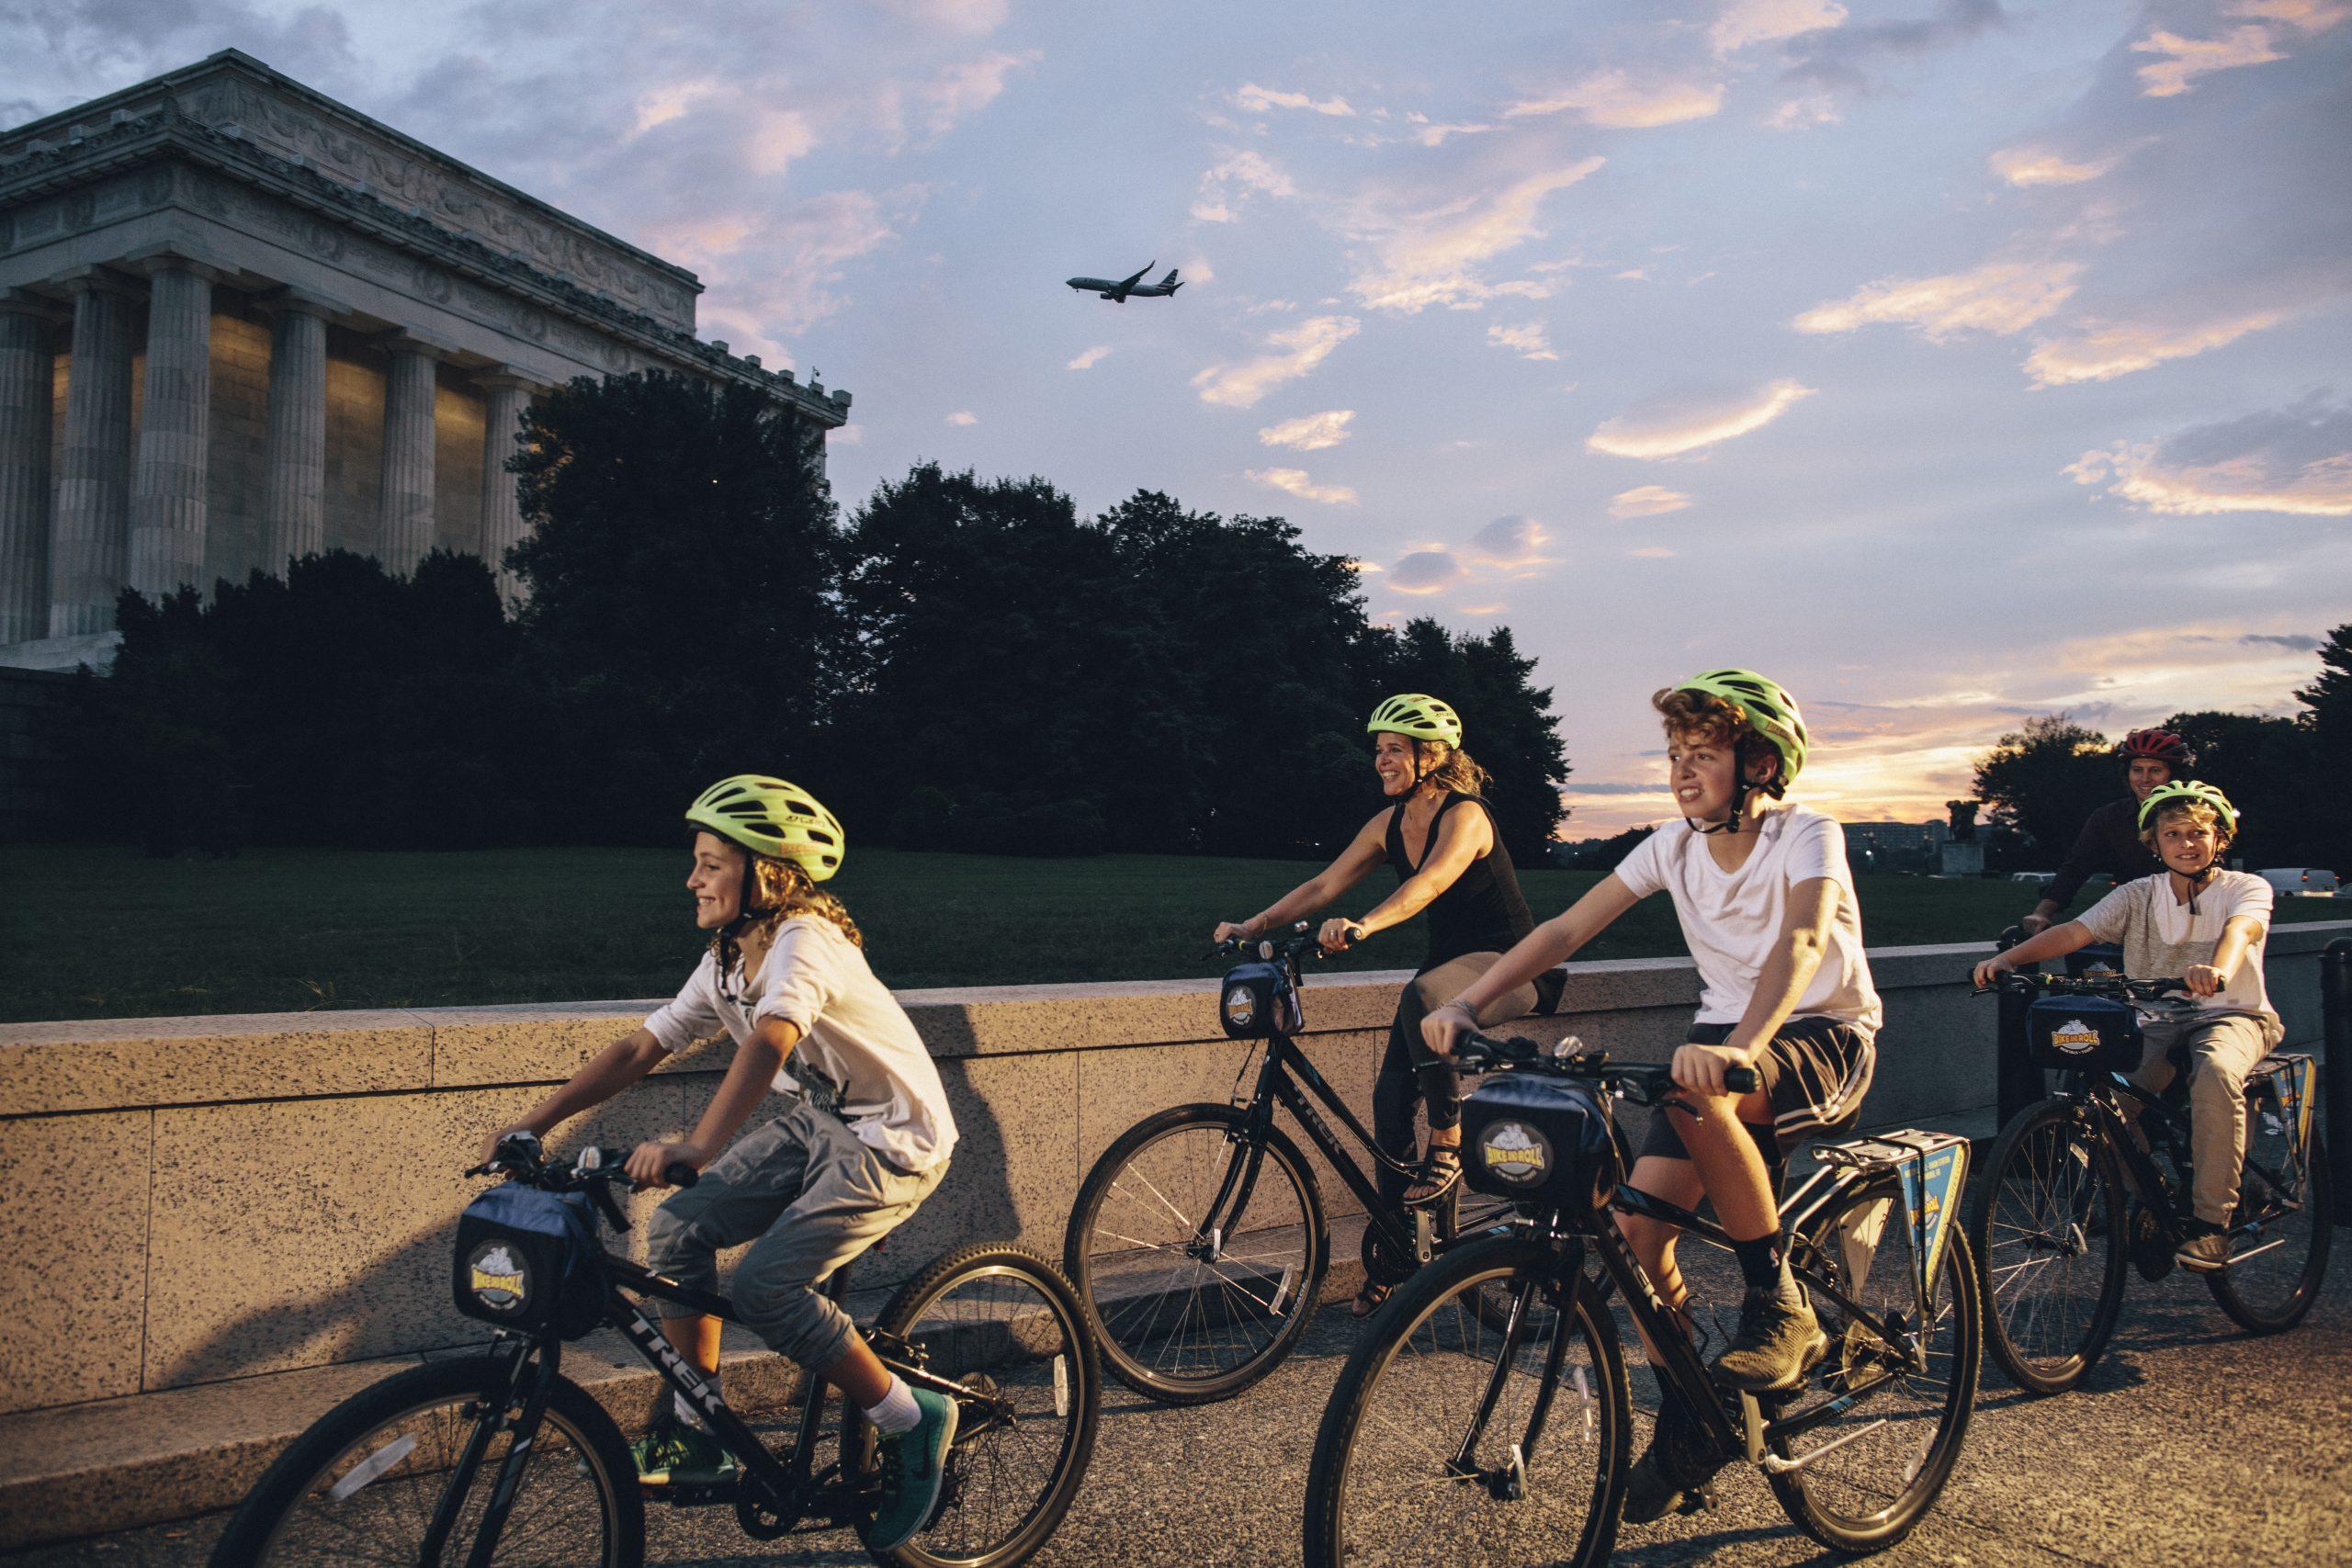 Lincoln-Memorial_Family-aBiking_CREDIT-Washington.org_-scaled